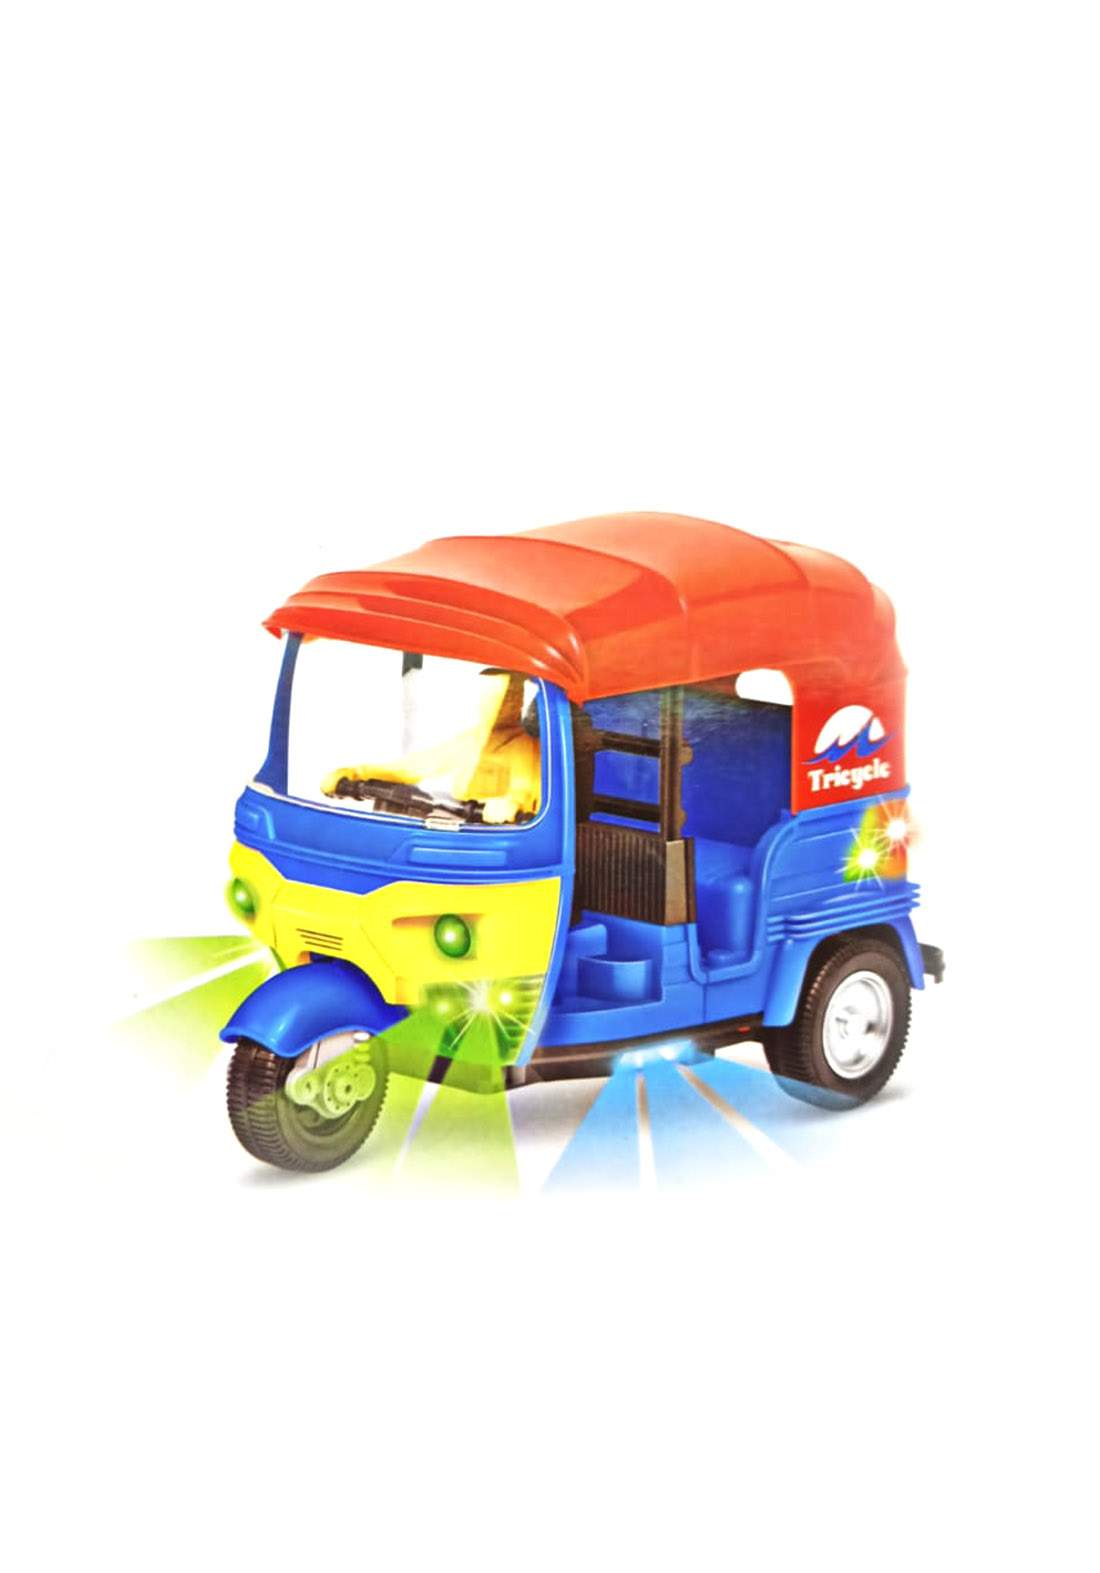 Auto Rickshaw Battery Operated Toy لعبة للأطفال